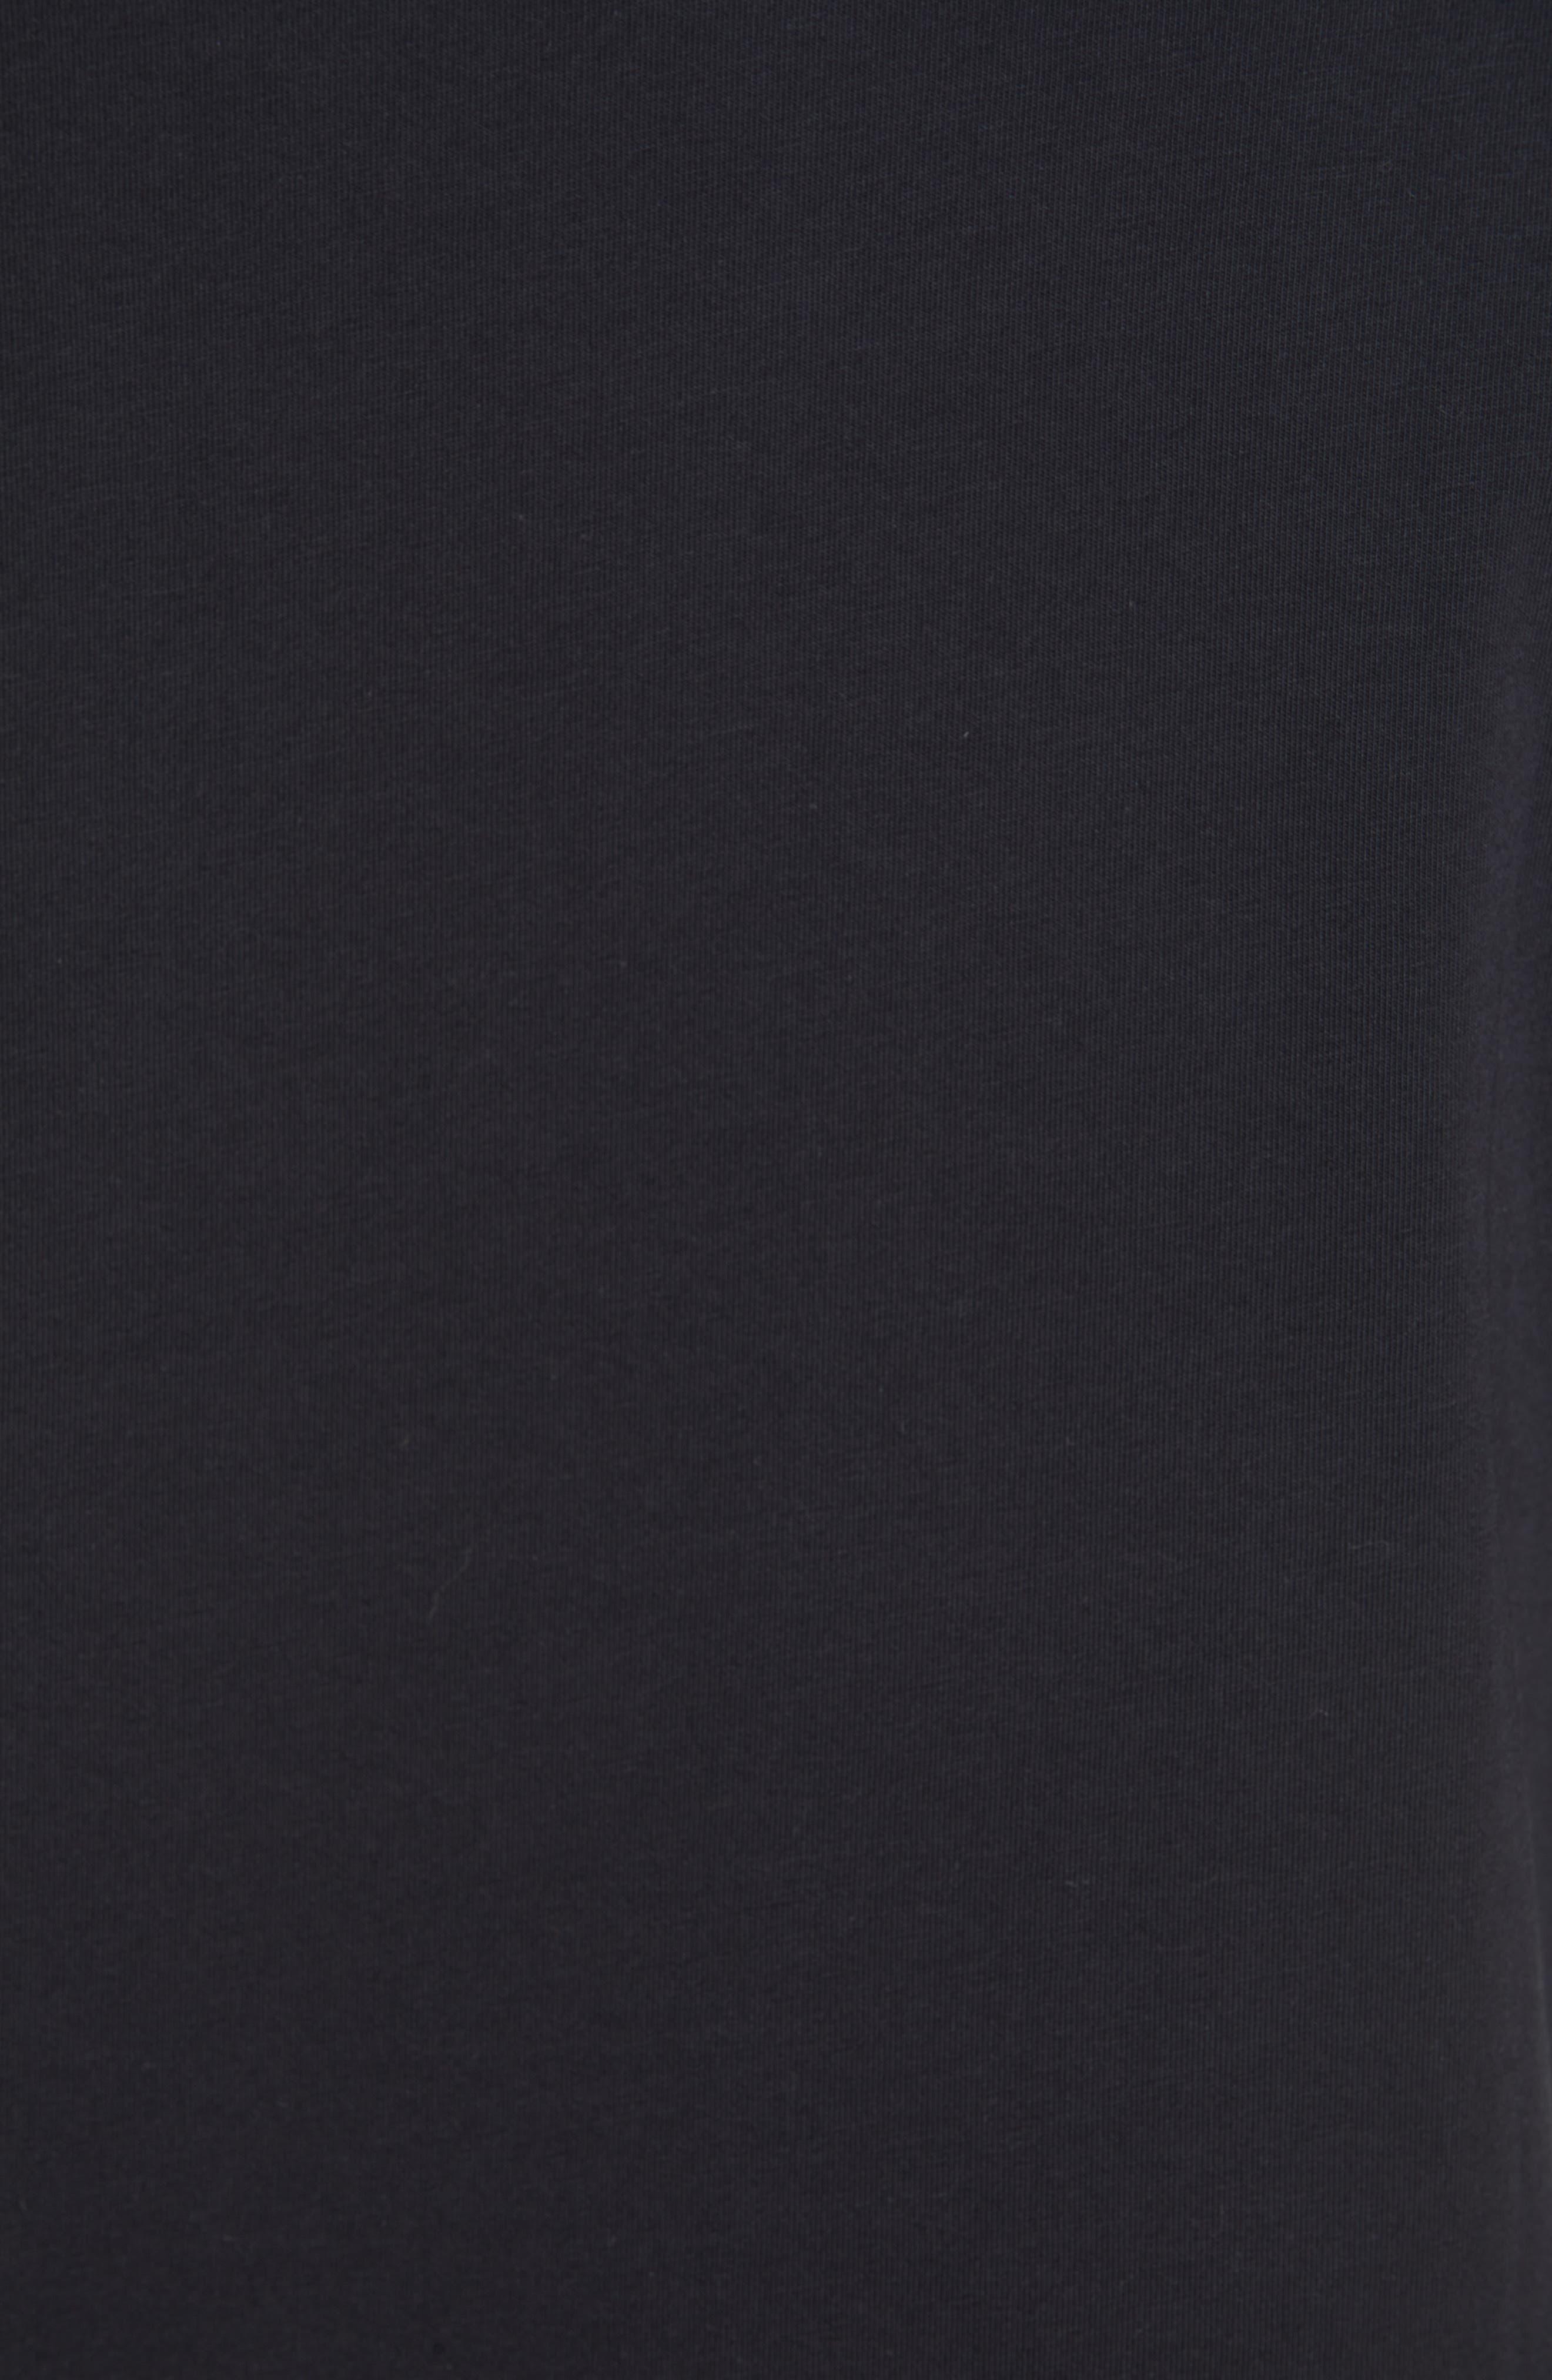 VERSACE COLLECTION, Medusa Long Sleeve T-Shirt, Alternate thumbnail 5, color, 001